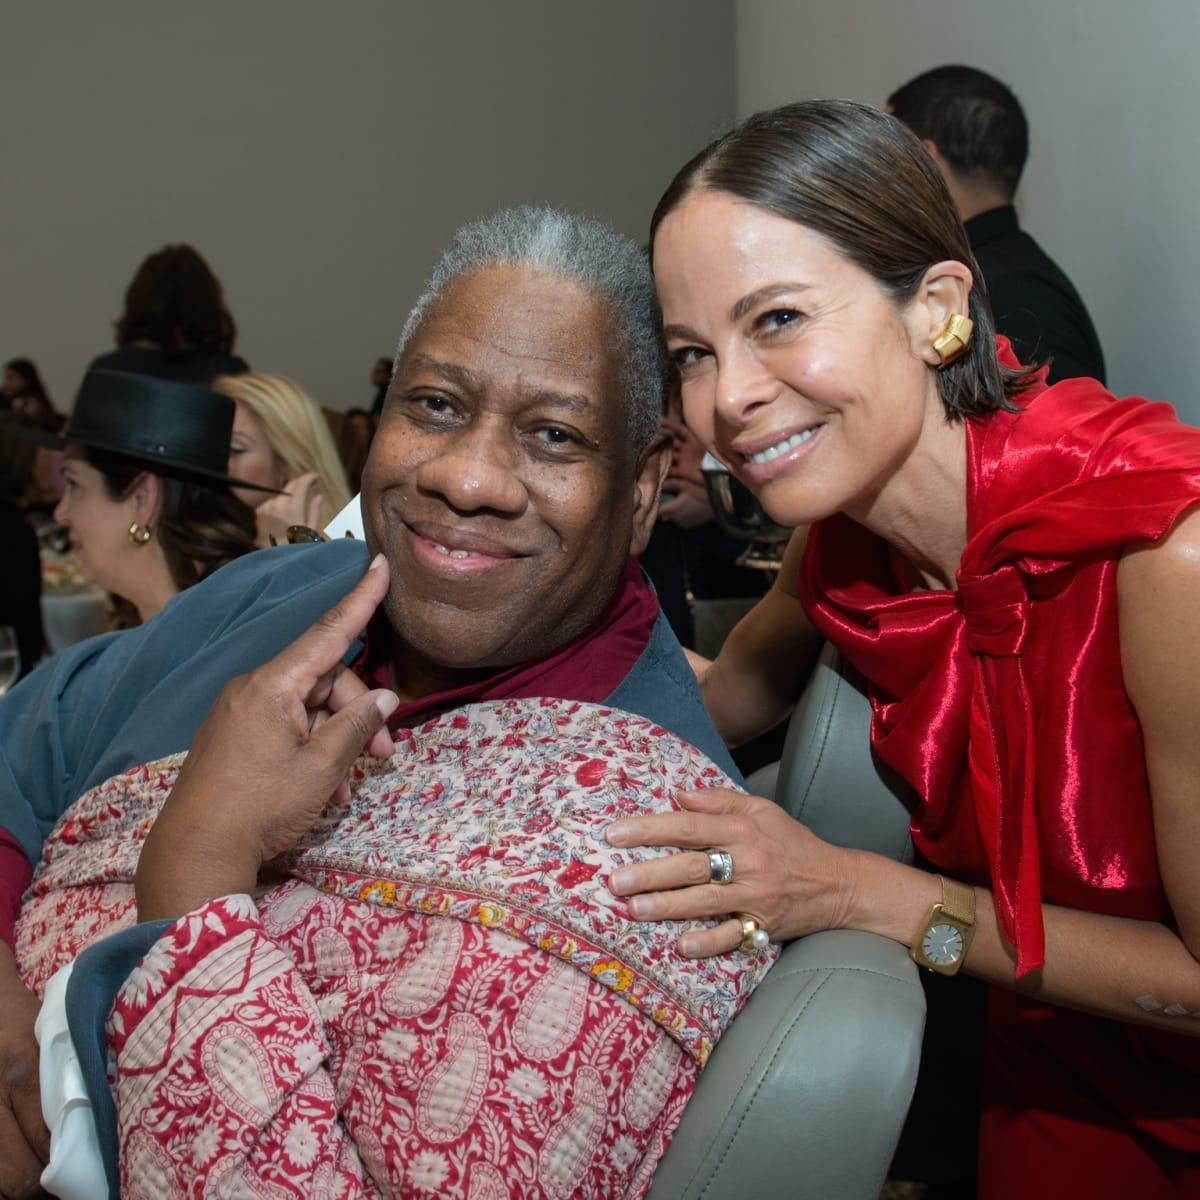 Andre Leon Talley, Allison Sarofim at Oscar de la Renta fashion show at MFAH